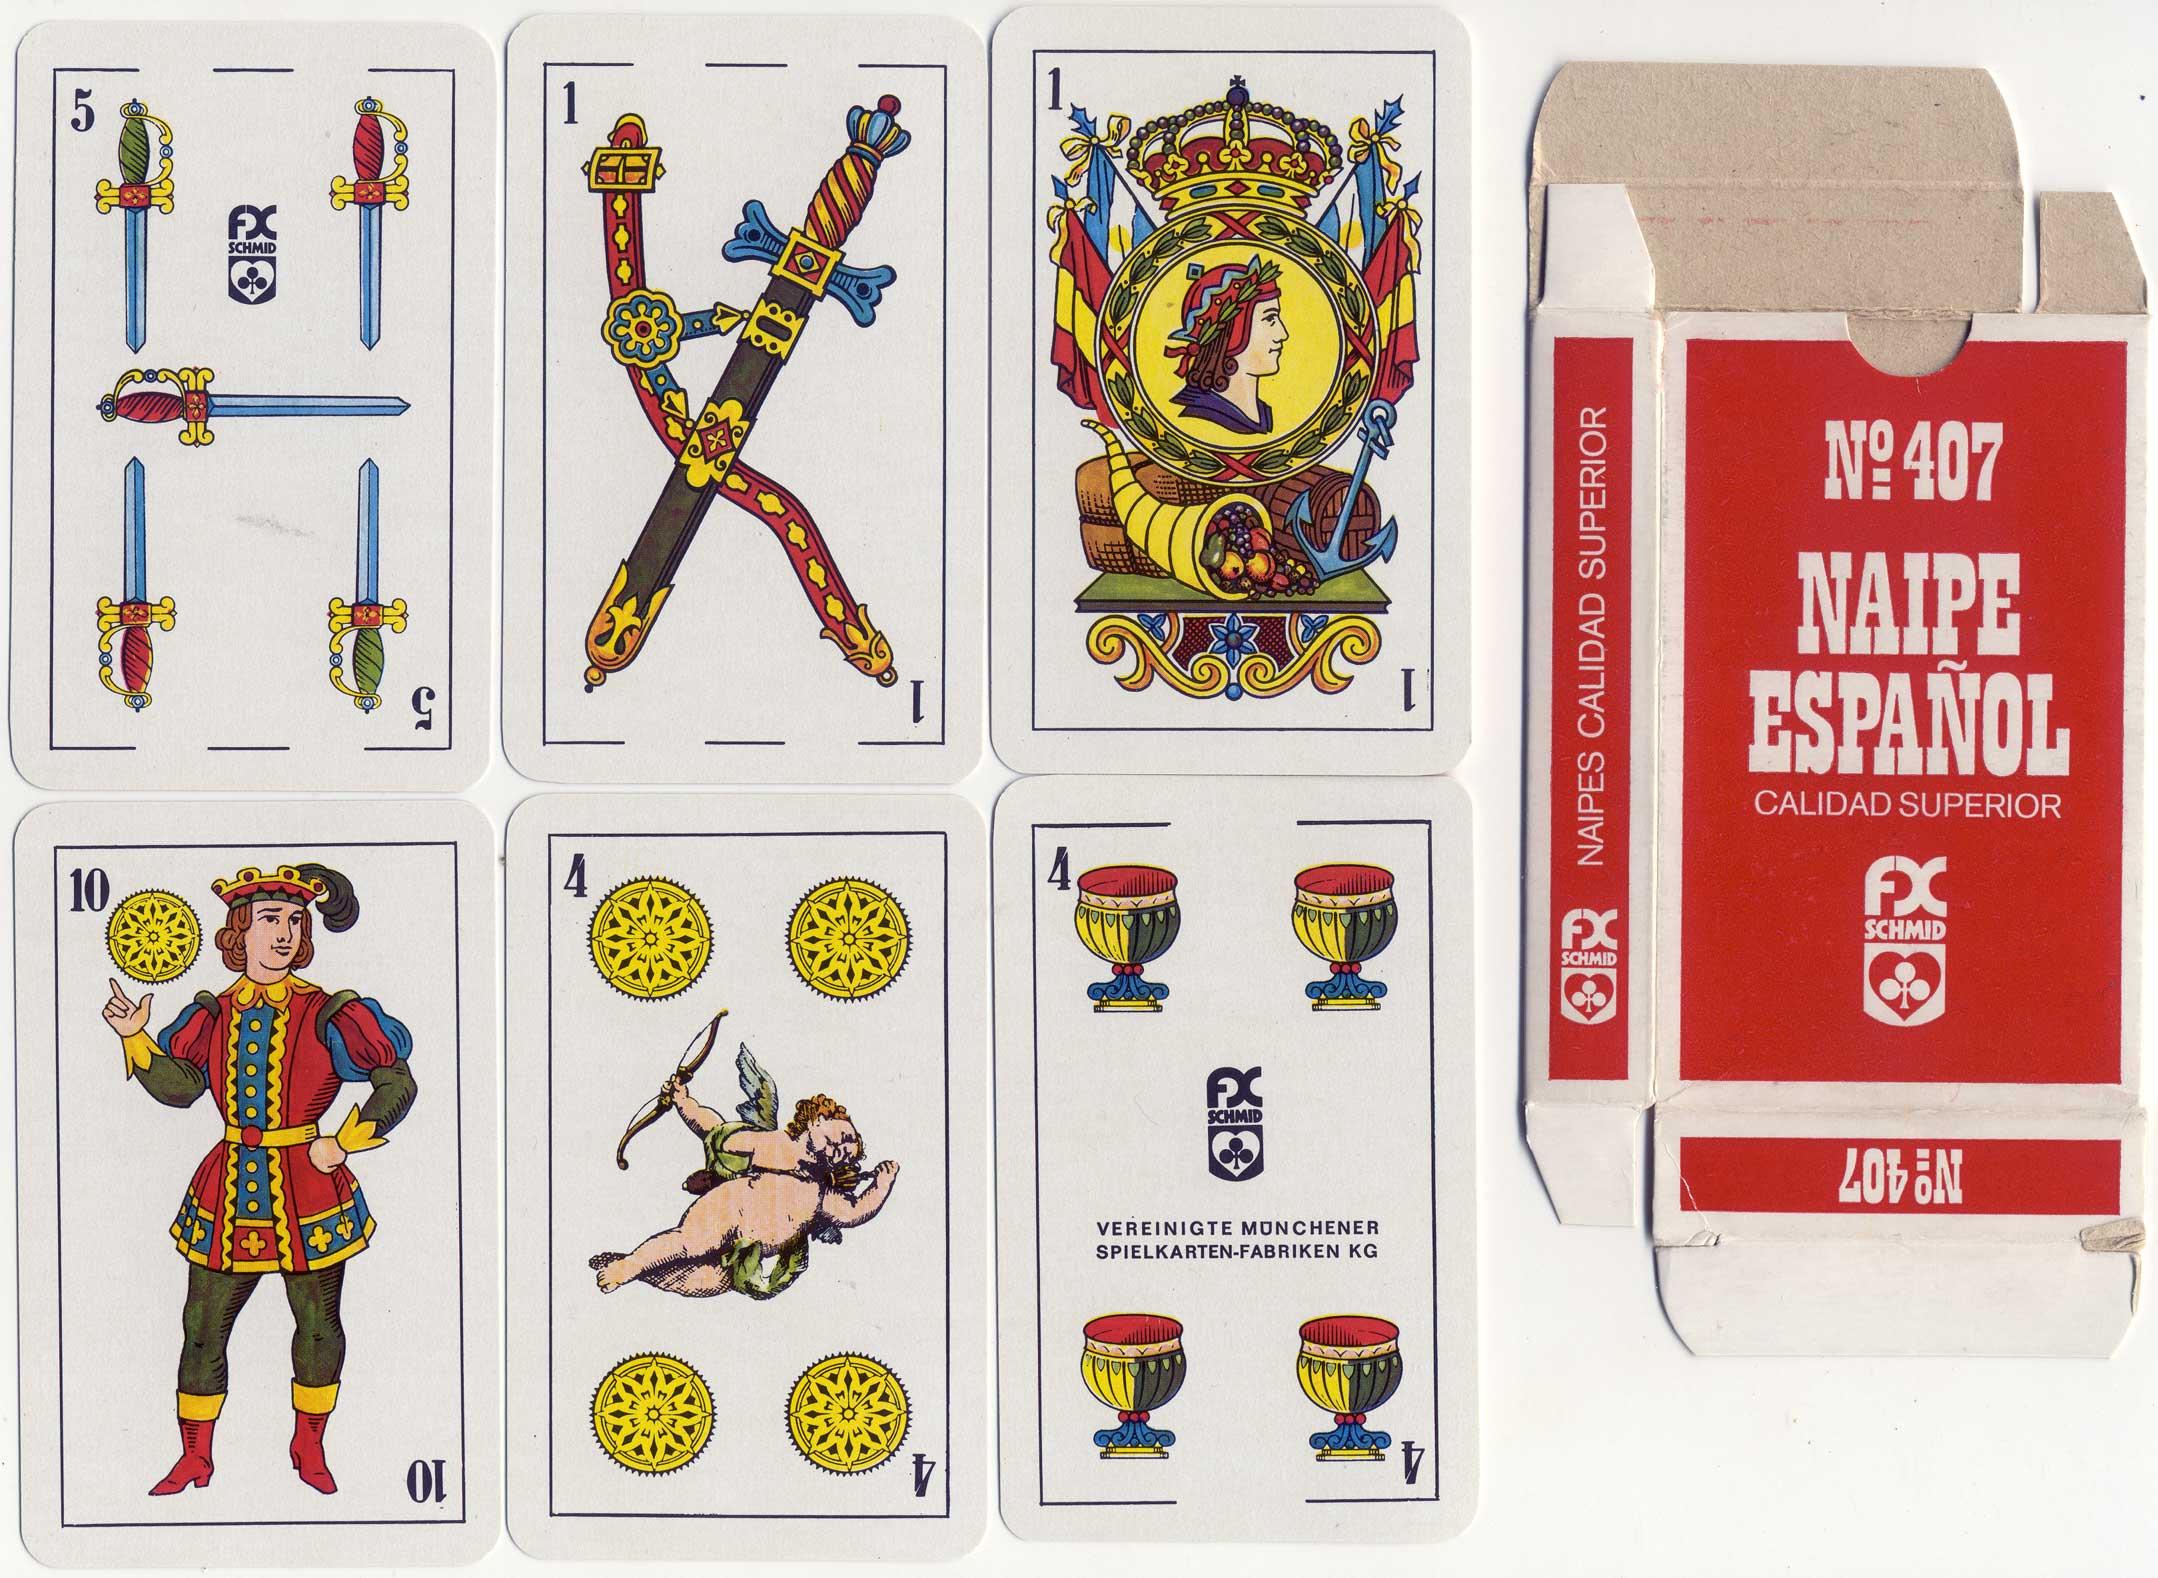 Naipe Español No.407 by F. X. Schmid, c.1980